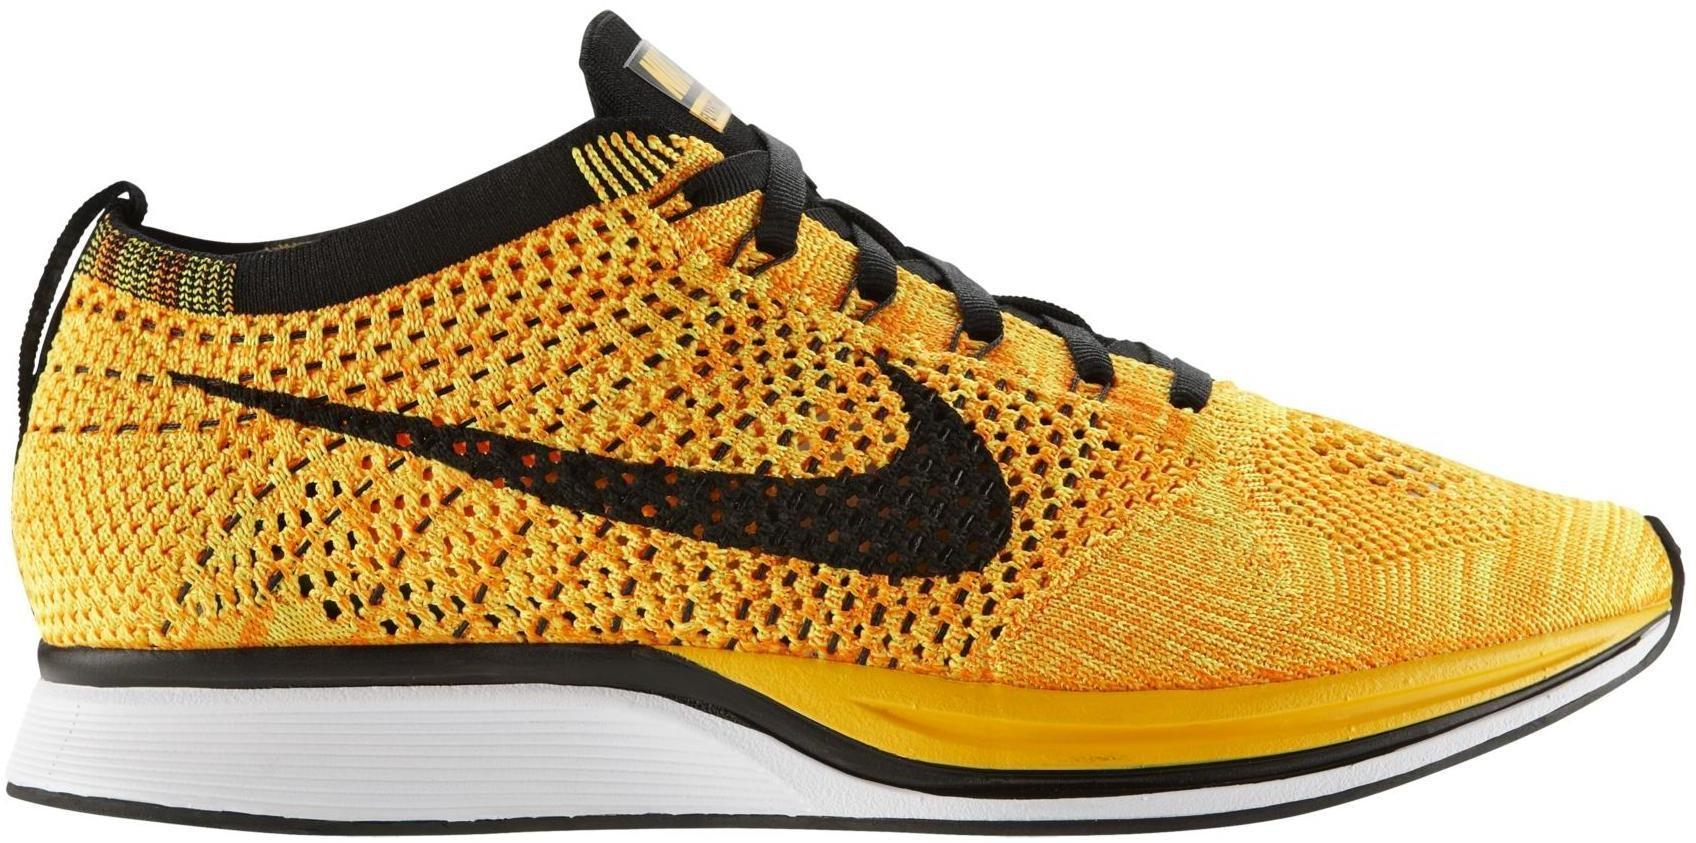 7d4cd4140fb4 nike flyknit runner yellow kd shoes